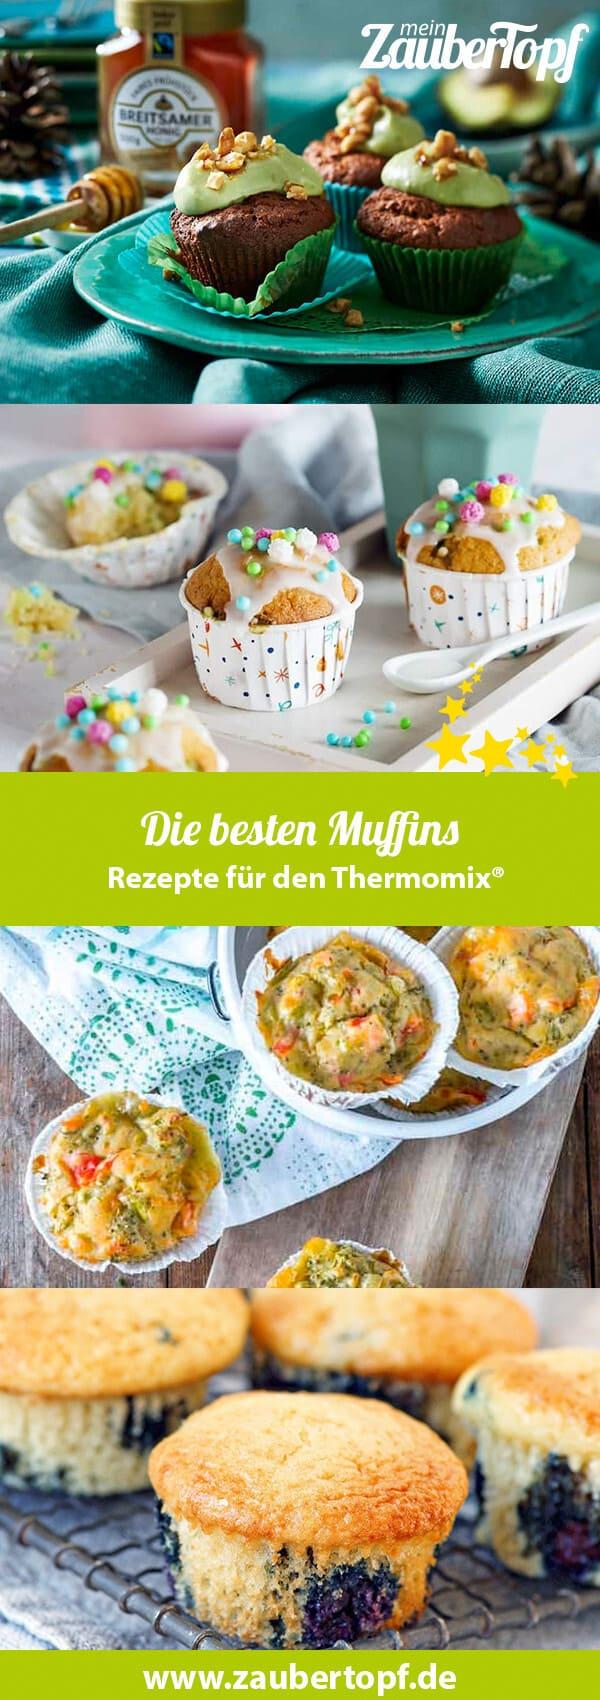 Muffins mit dem Thermomix® – Fotos: Alexandra Panella, Breitsamer Honig, Shutterstock, Tina Bumann